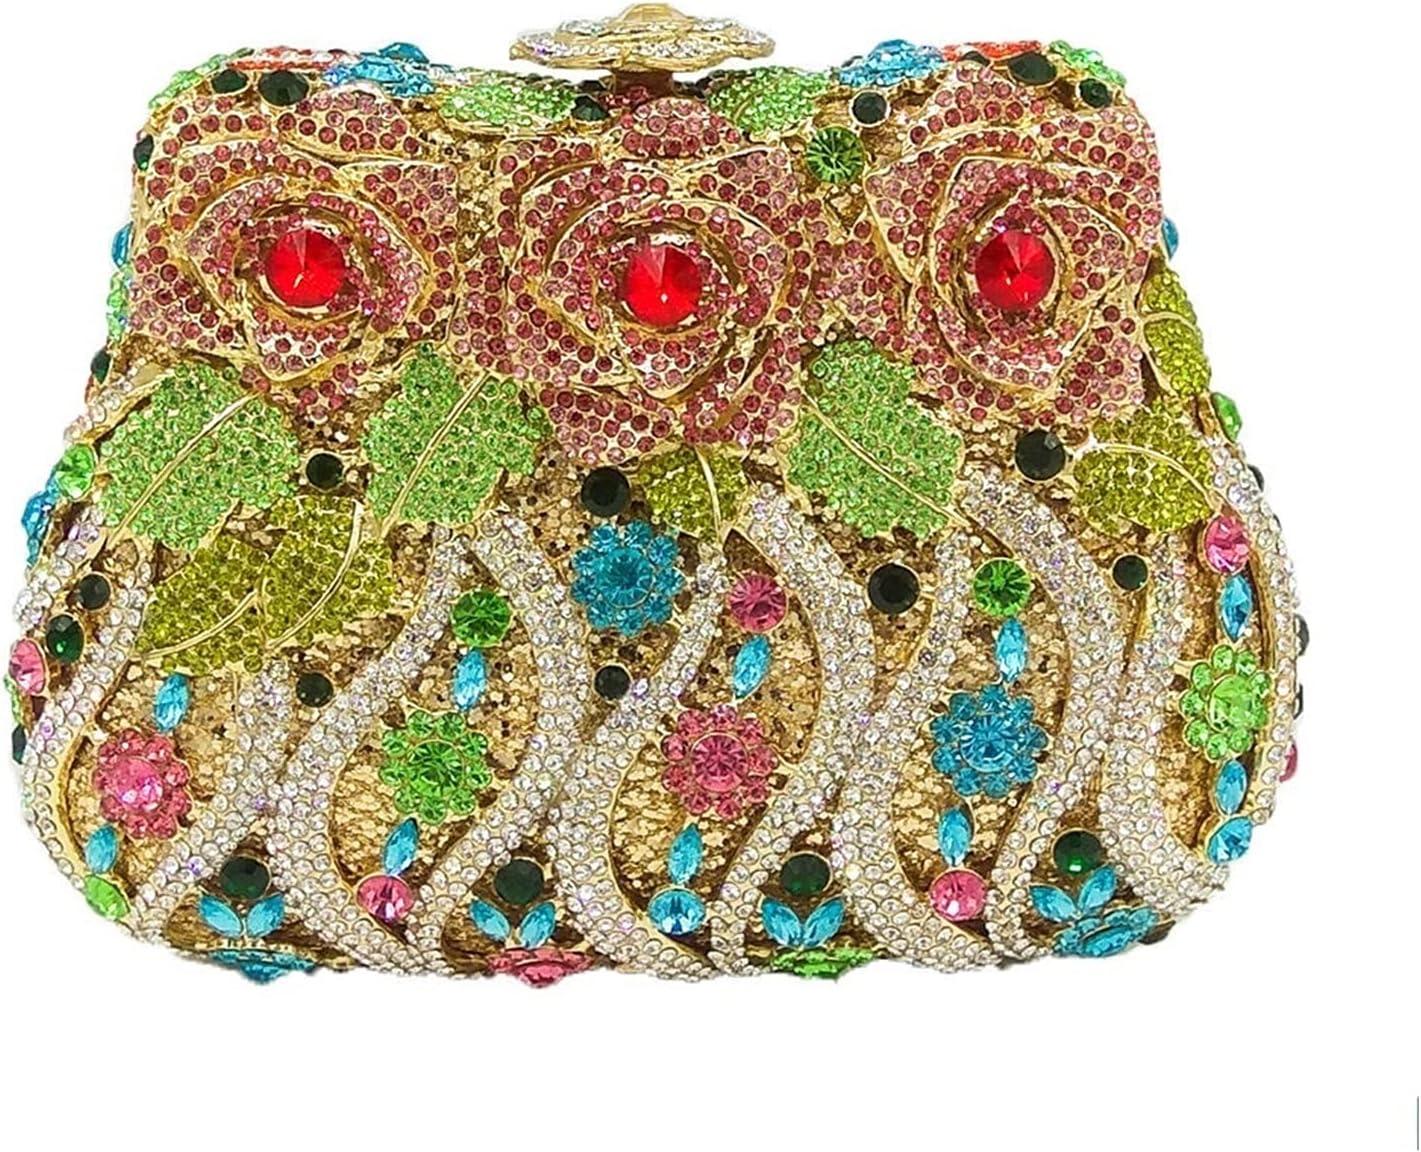 A+TTXH+L Evening Bag Women Crystal Purse Evening Clutch Bag Bridal Diamond Clutch Wedding Party Minaudiere (Color : A, Size : 1)